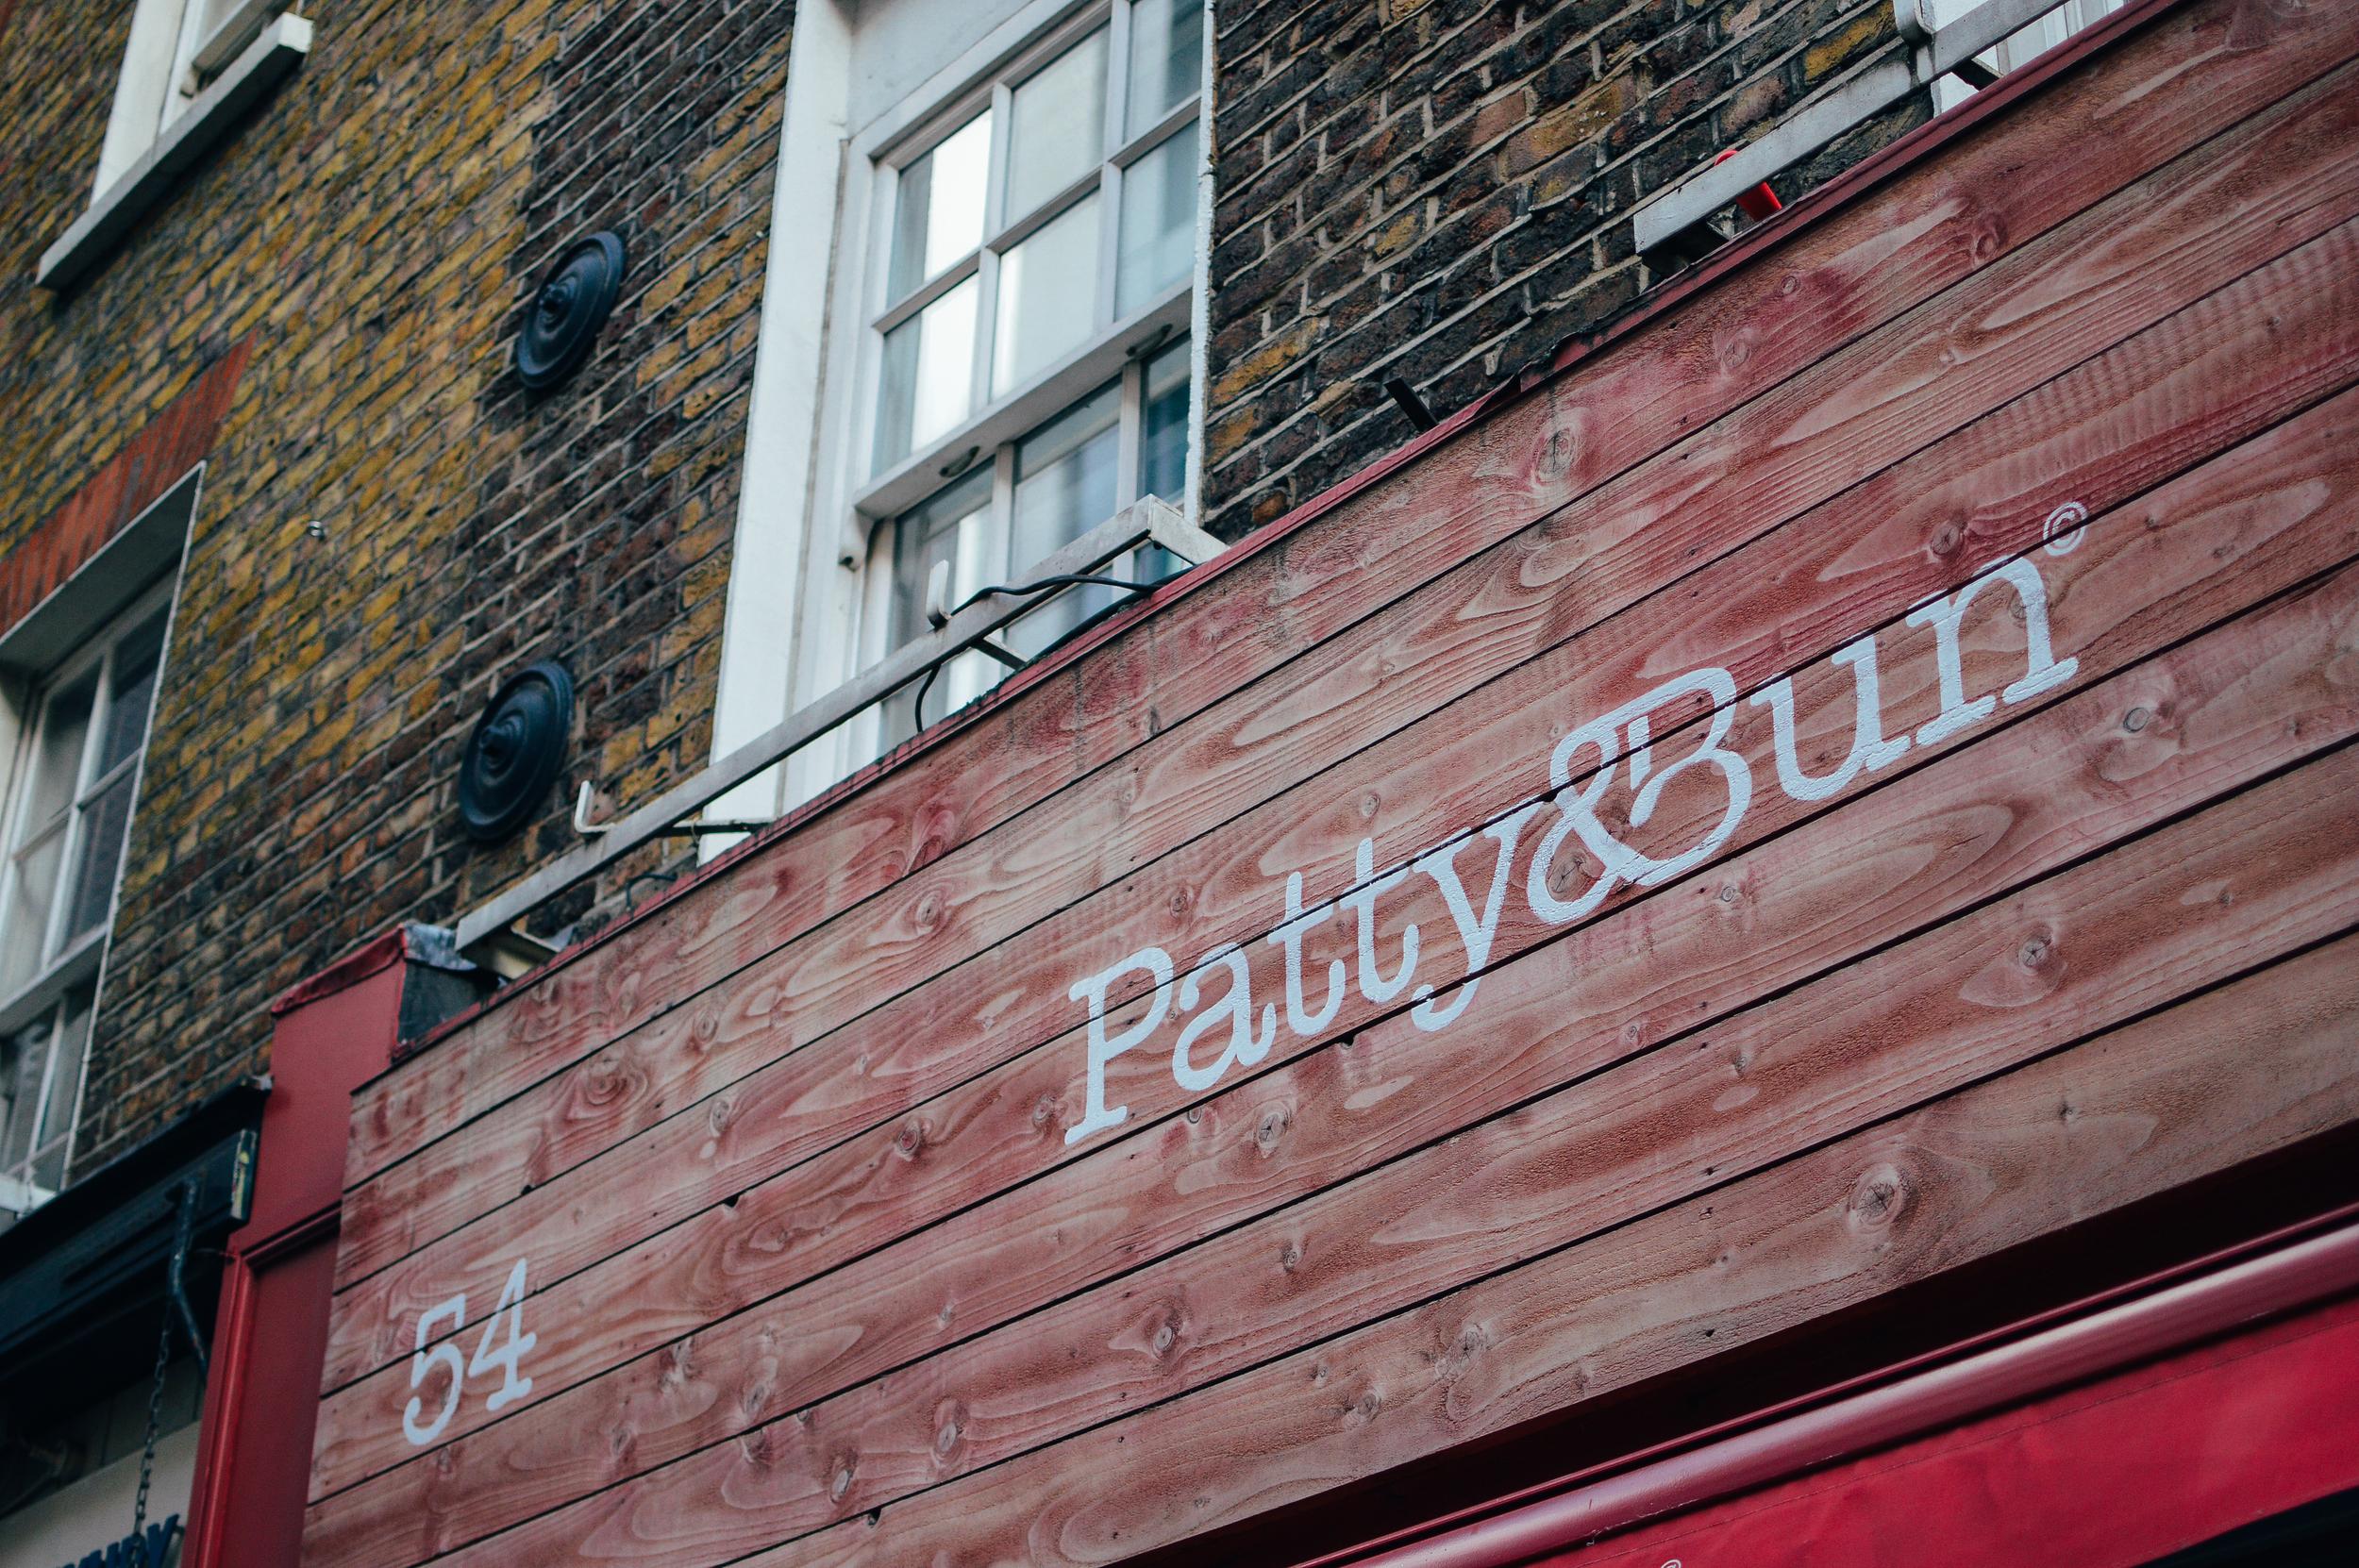 patty & bun sign voyage collective